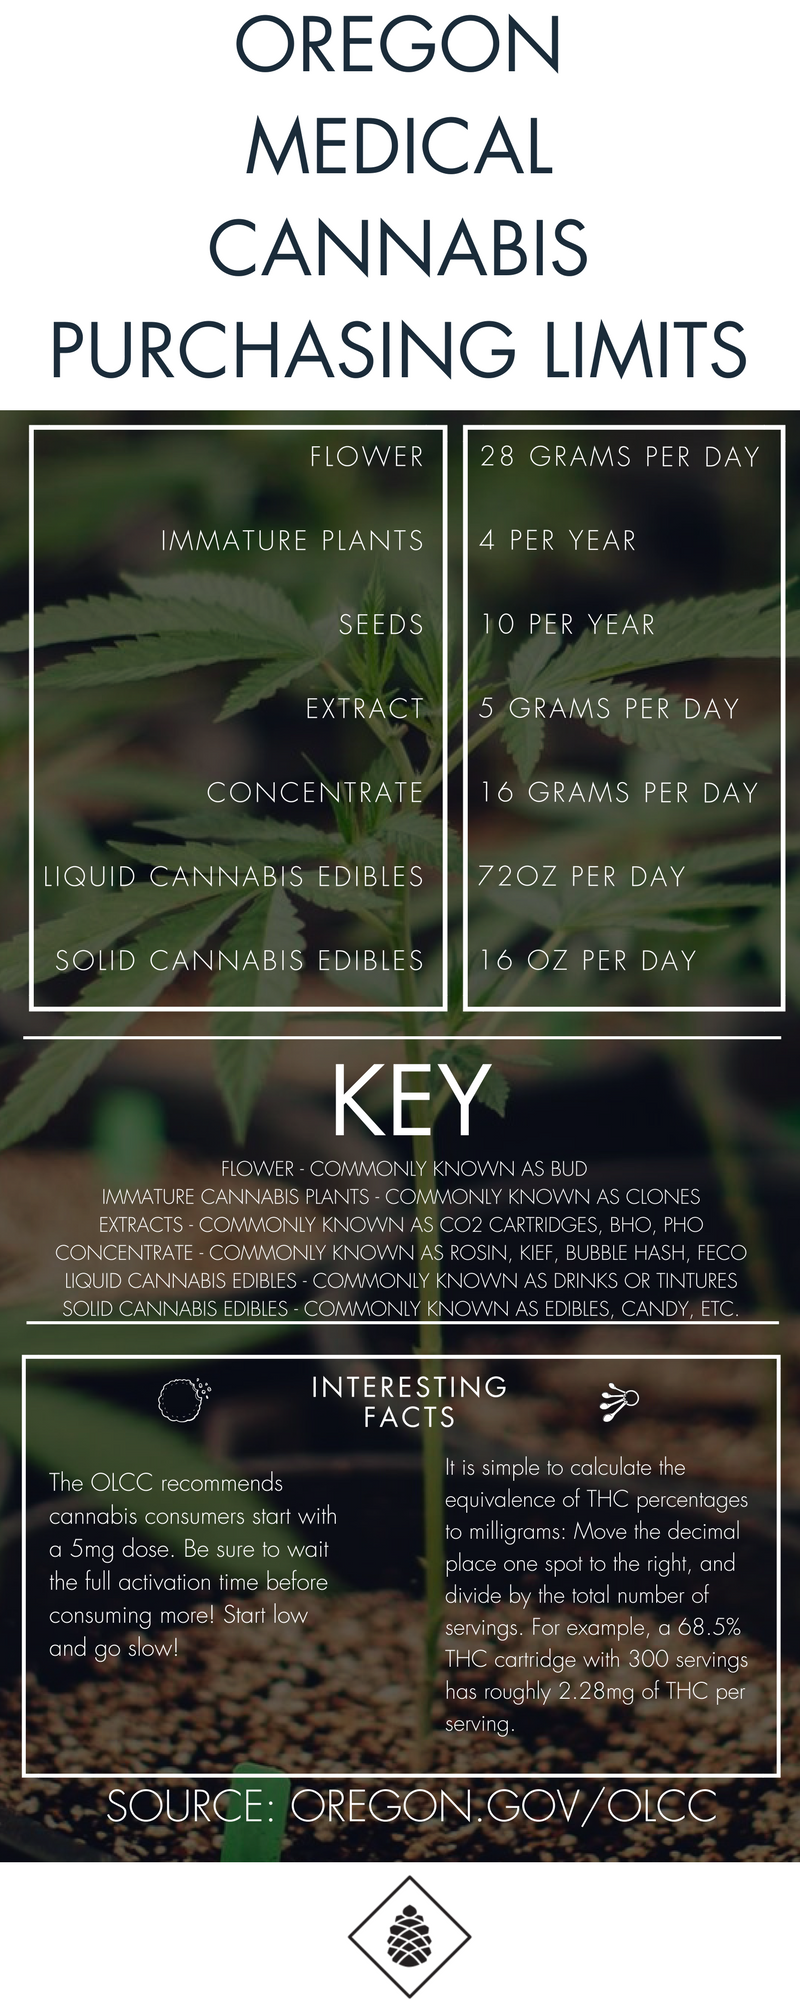 Oregon Medical Cannabis Purchasing Limits(1).png